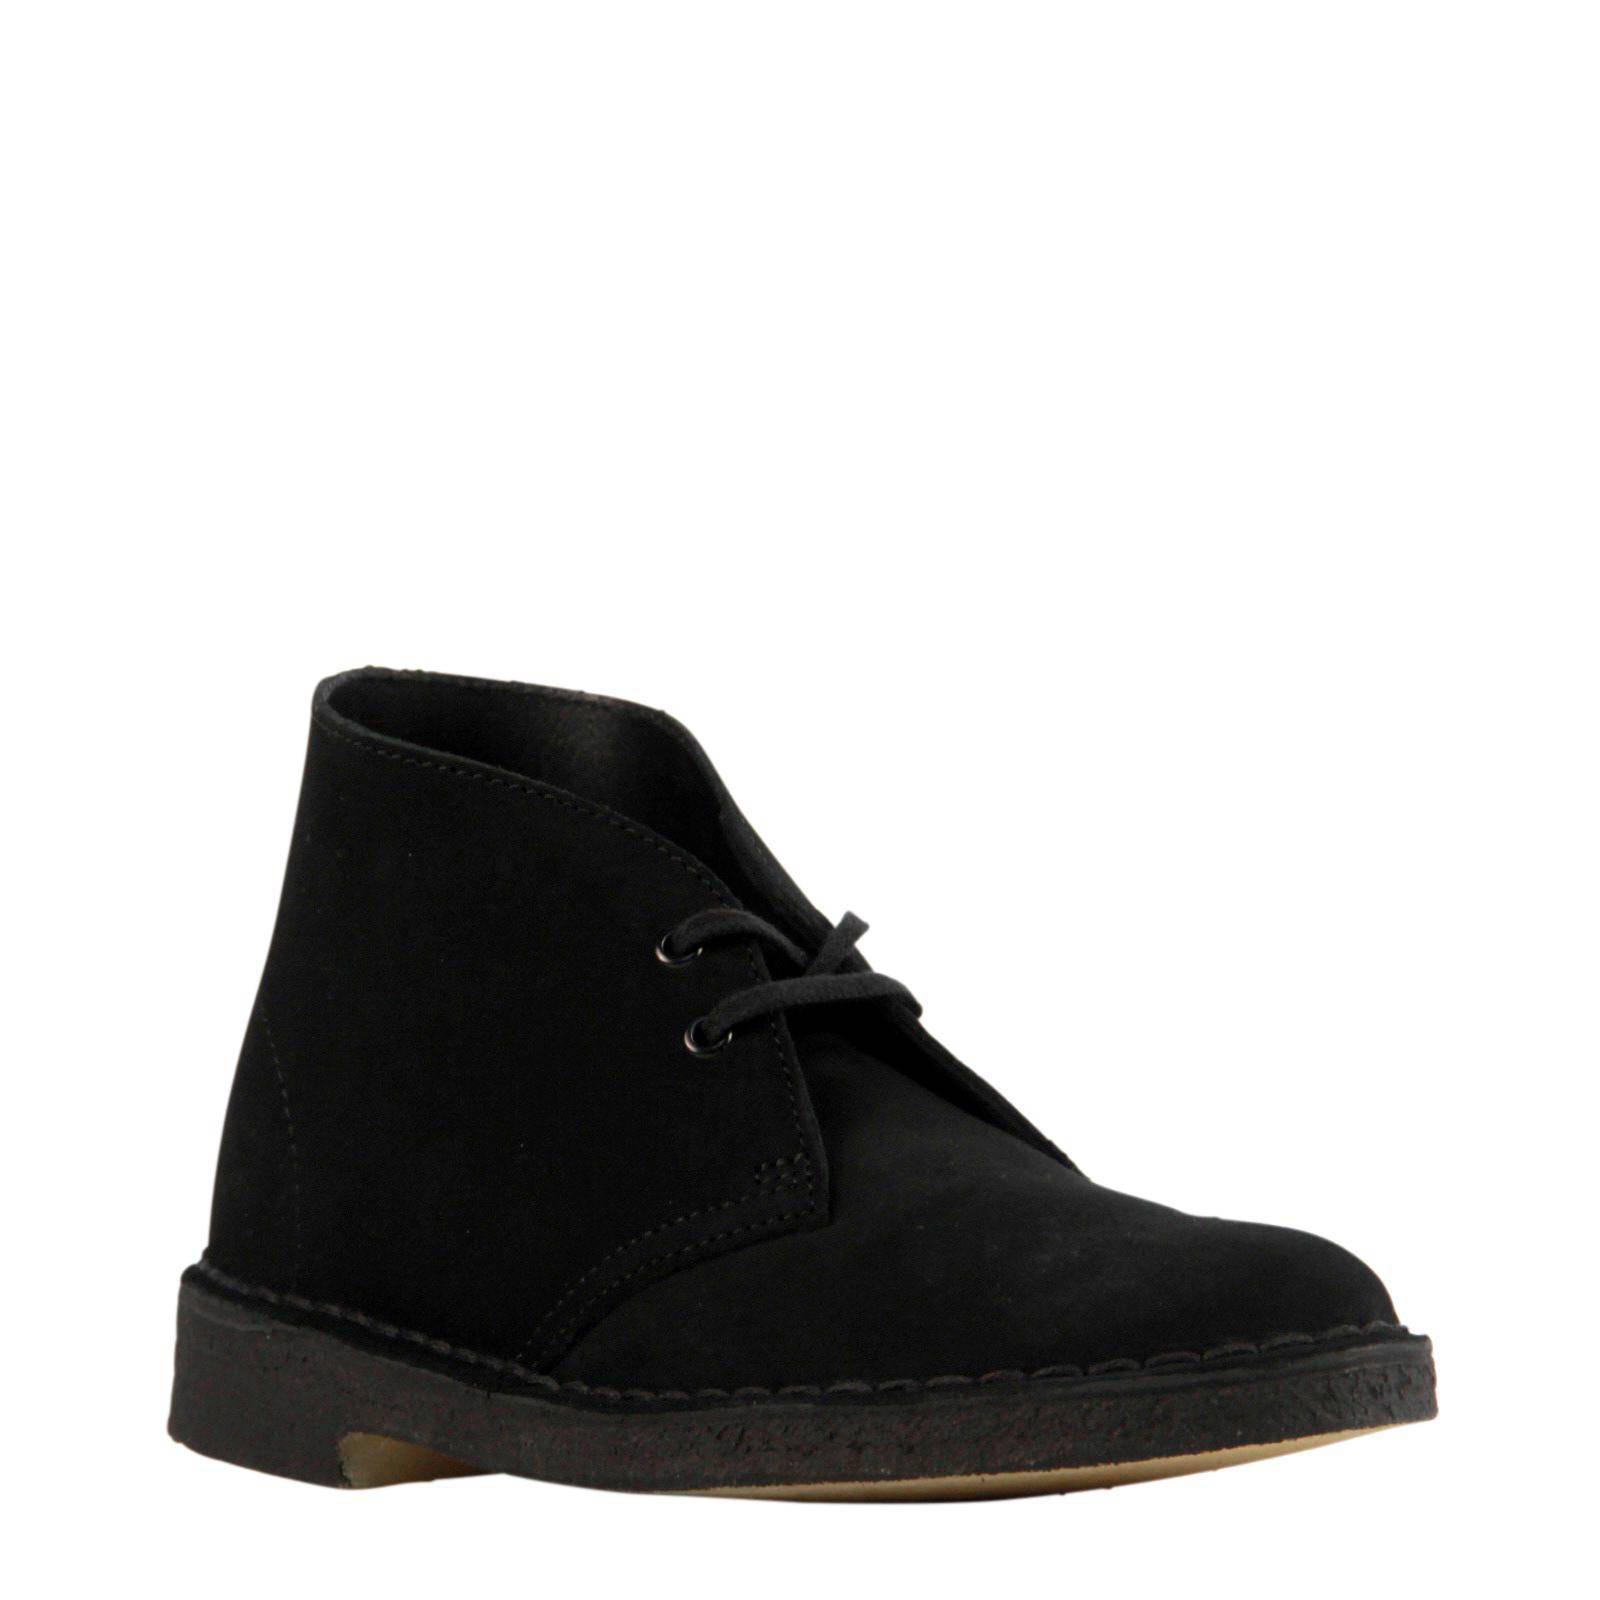 Boots Clarks Originals Suède Wehkamp Desert xHY6t067B